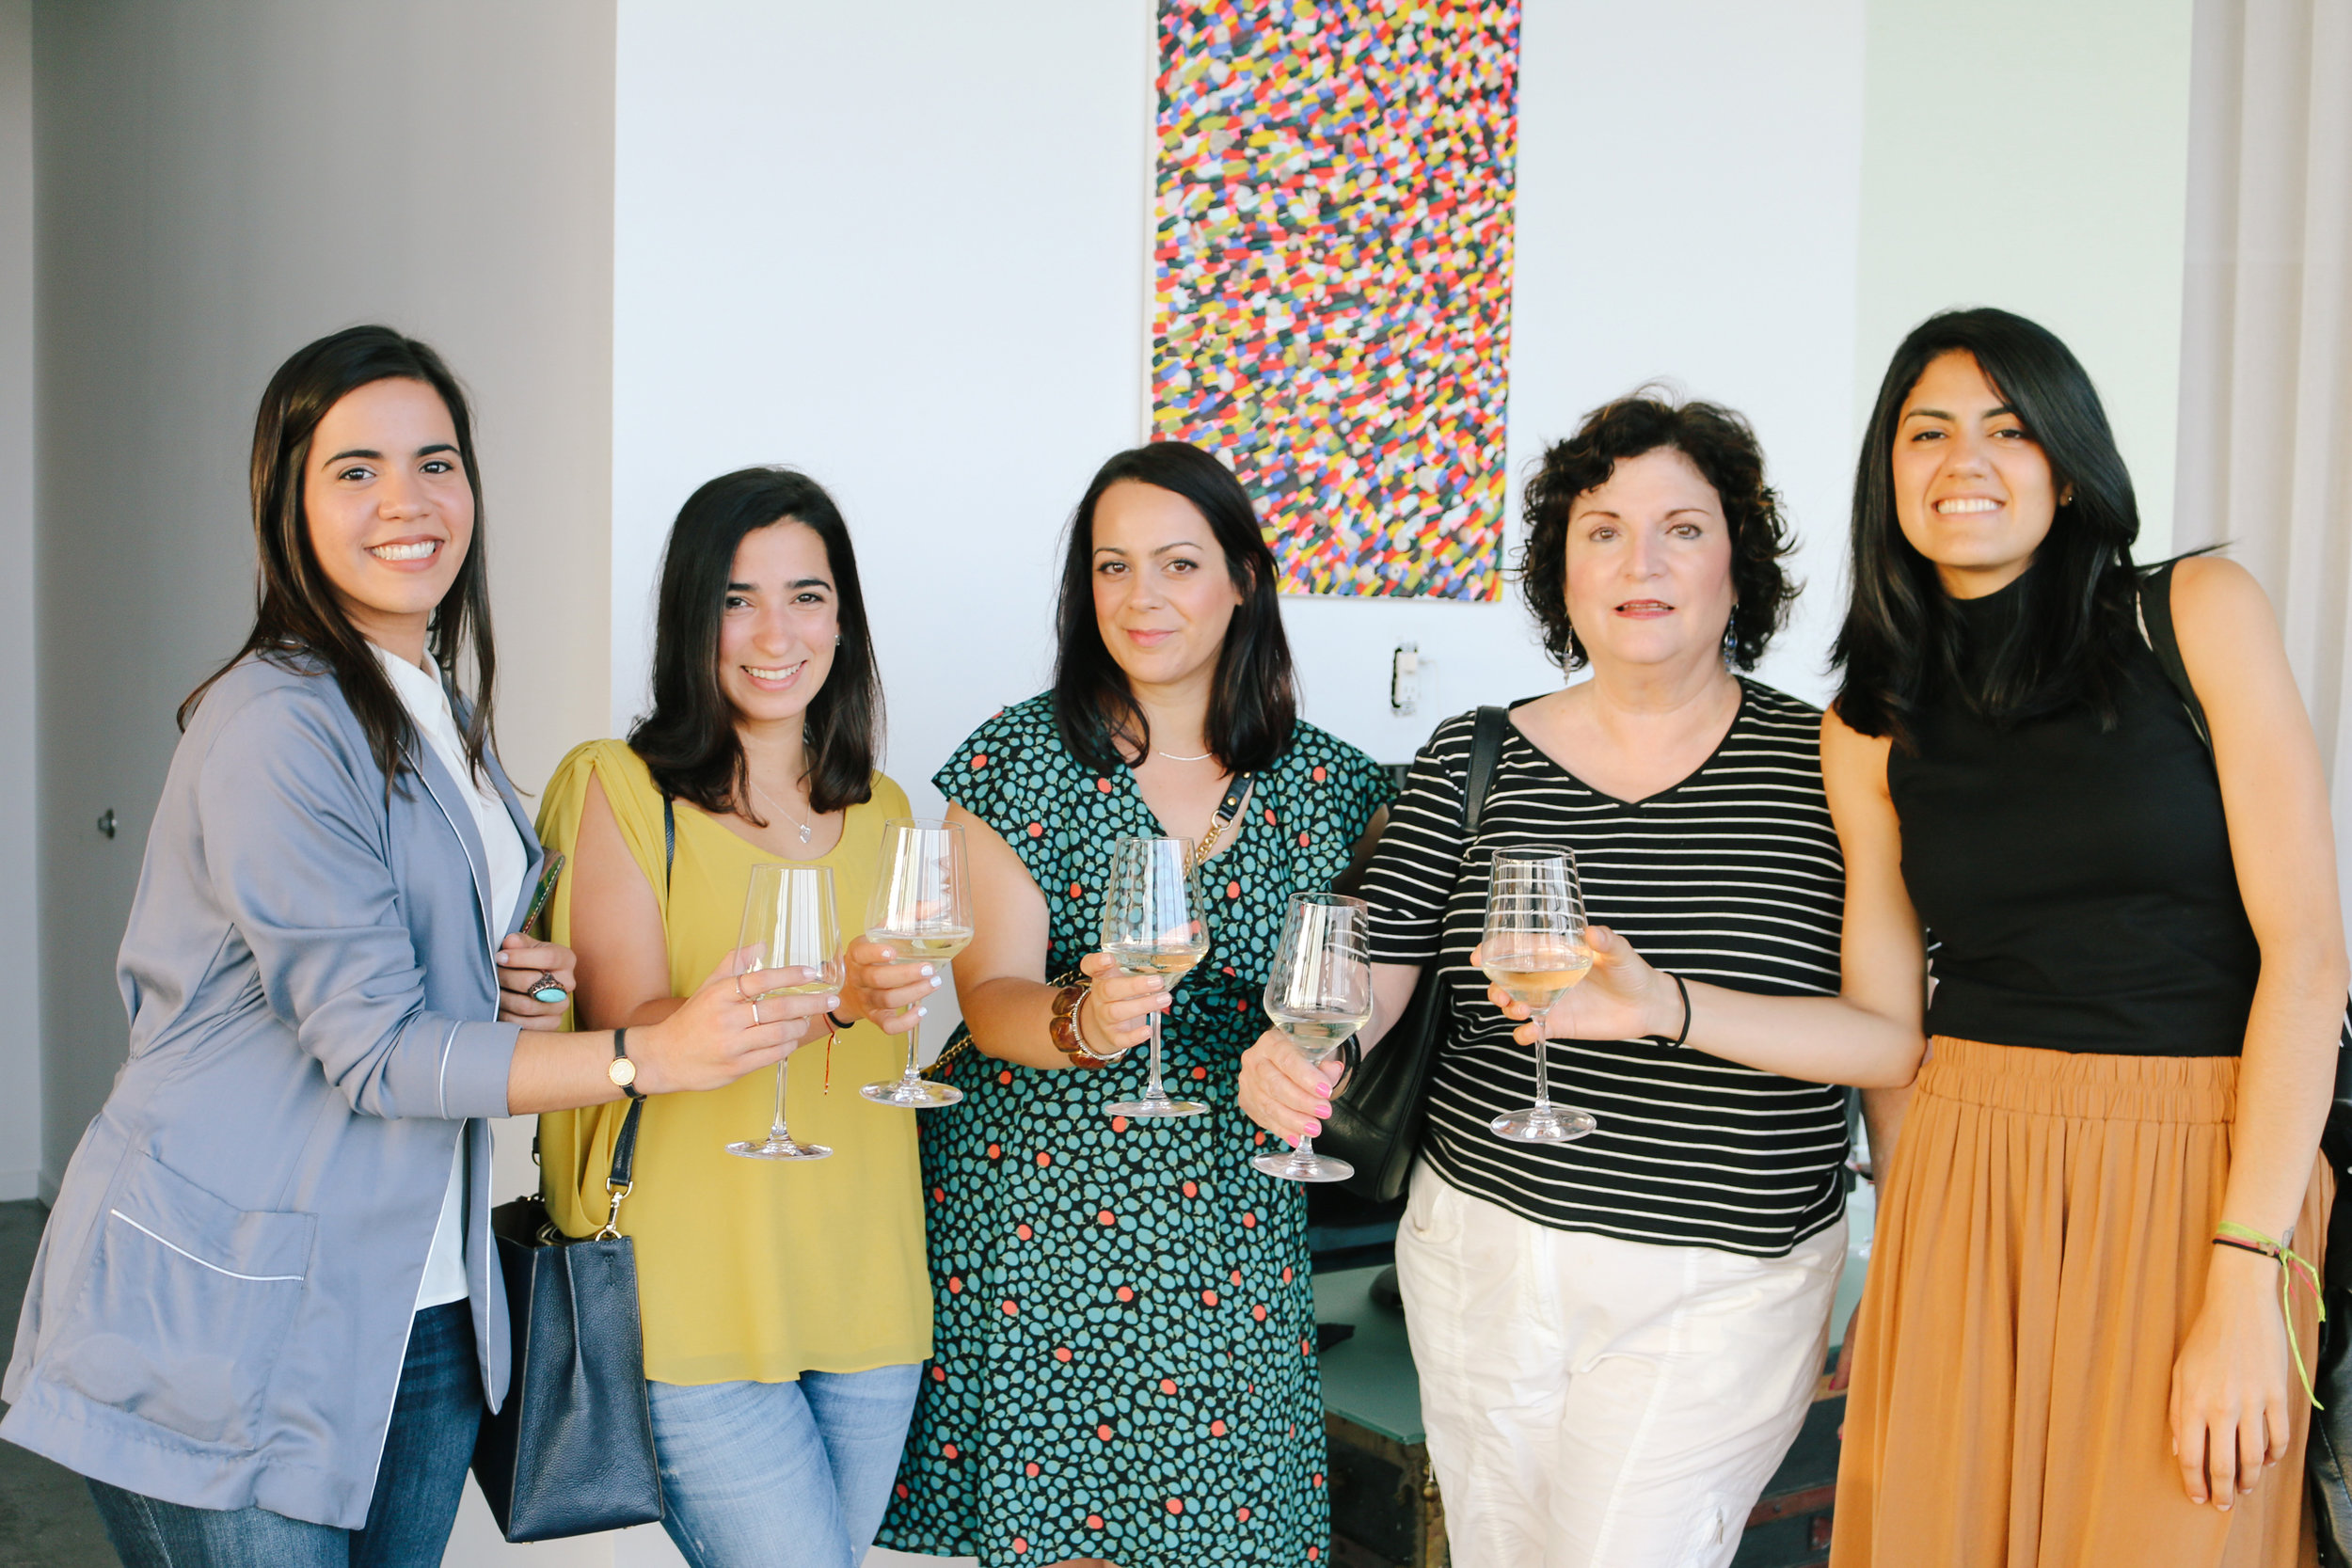 Women Who Wine Uncorked Conversations-Miami Wine Events-Wine Tasting Miami-17.jpg